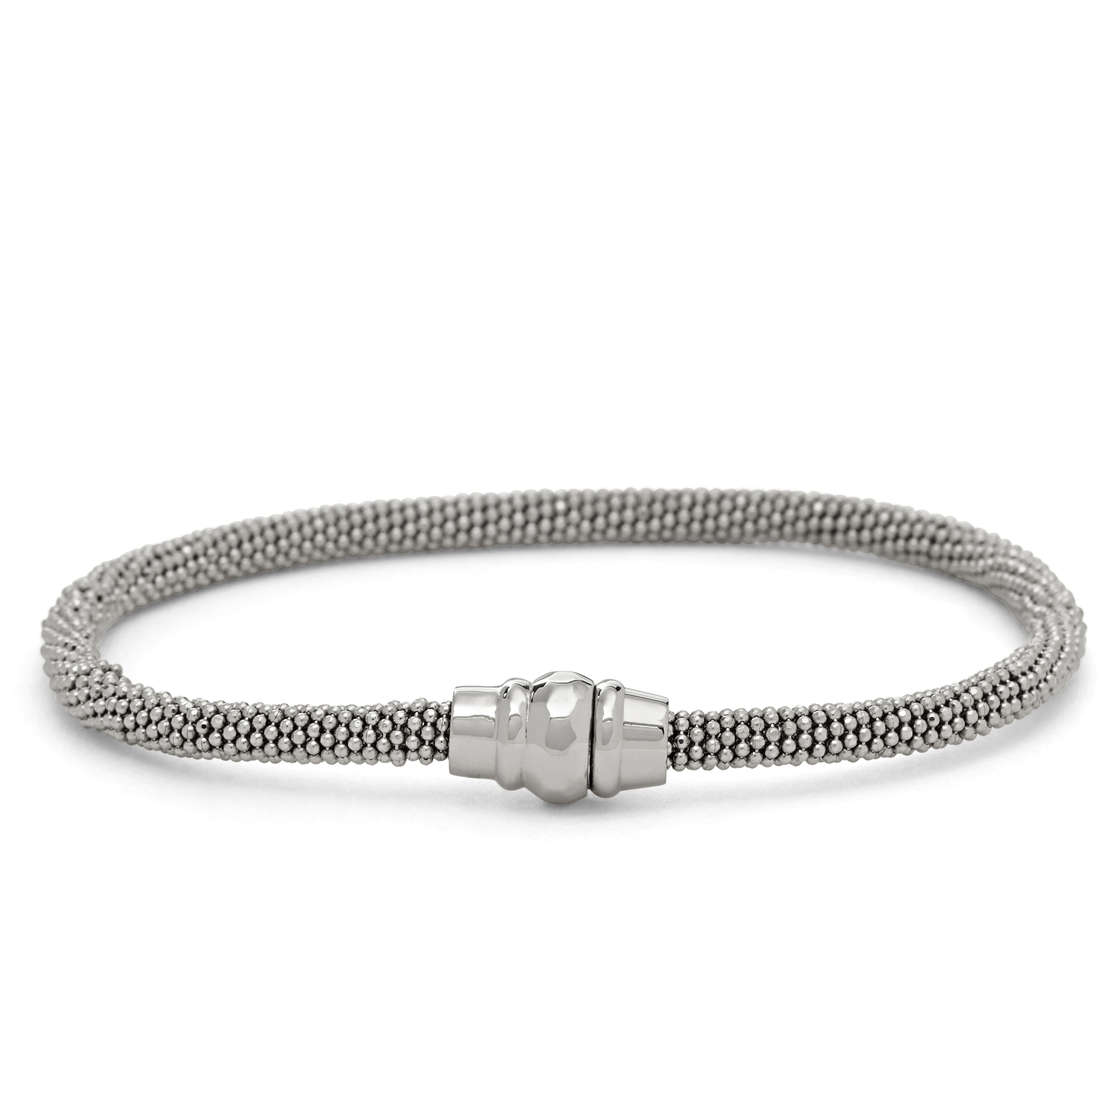 bracelet woman jewellery Fossil JA6294040